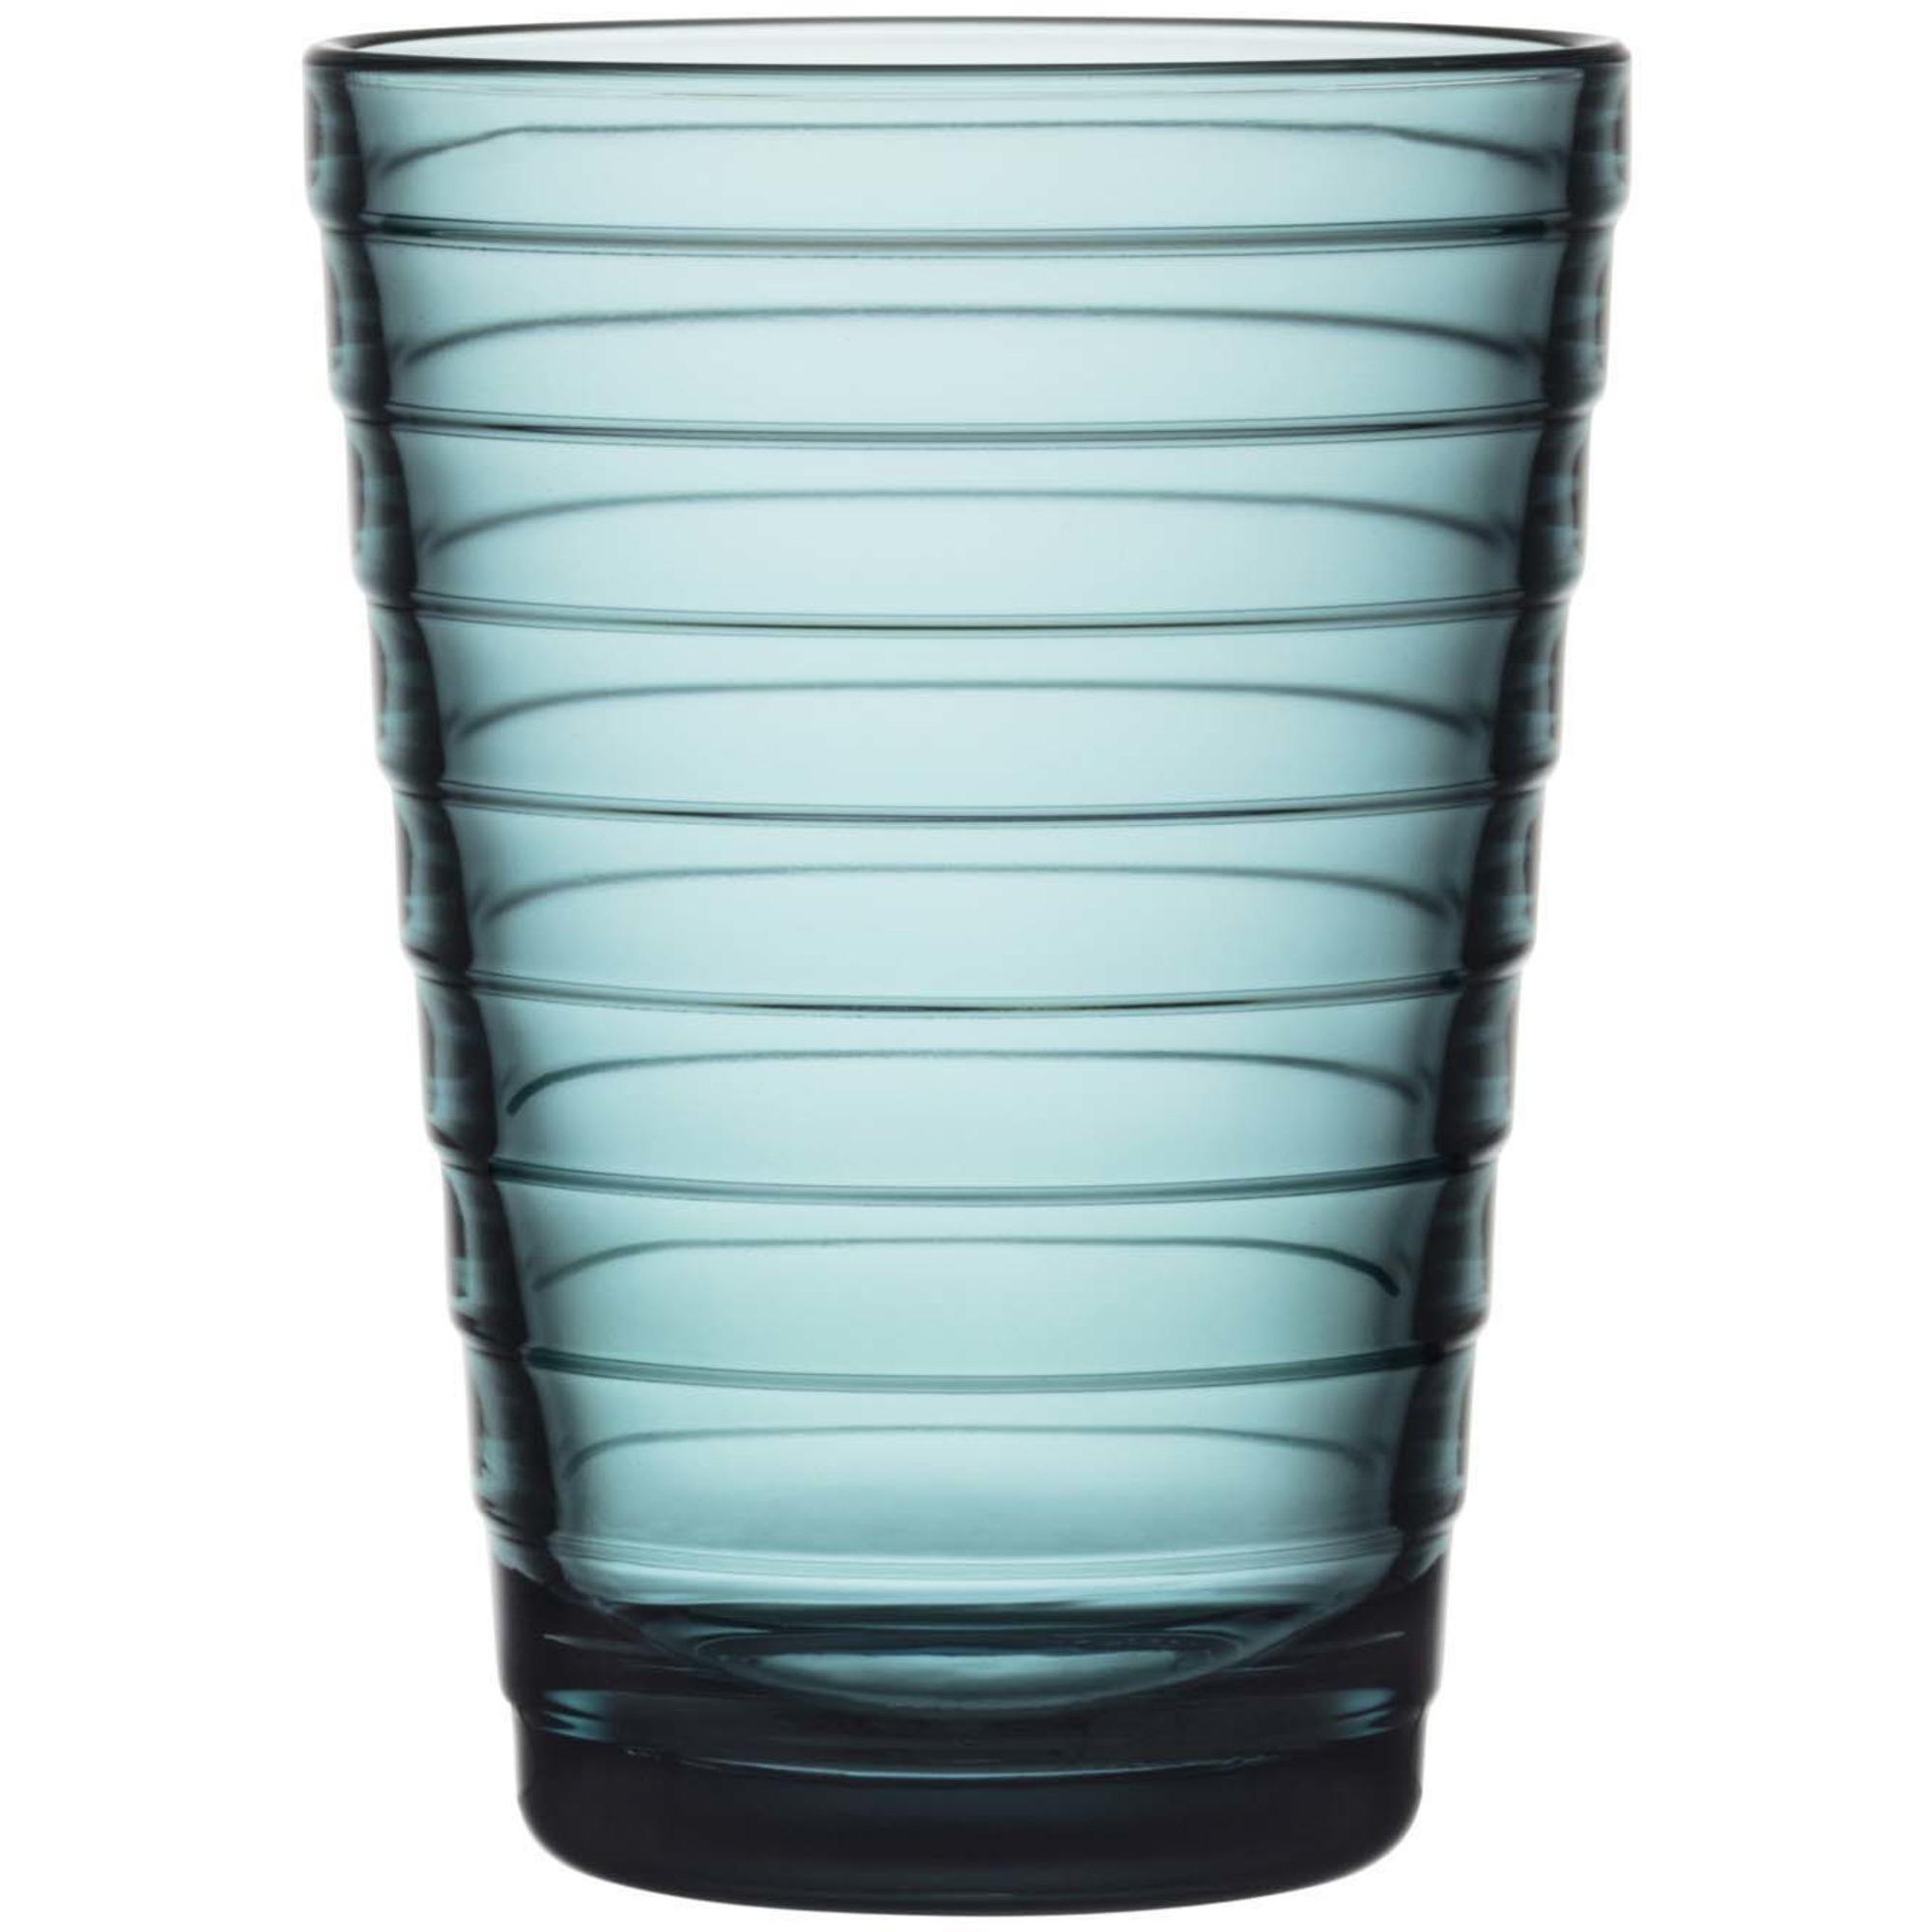 Iittala Aino Aalto glas 33 cl havsblå 2 st